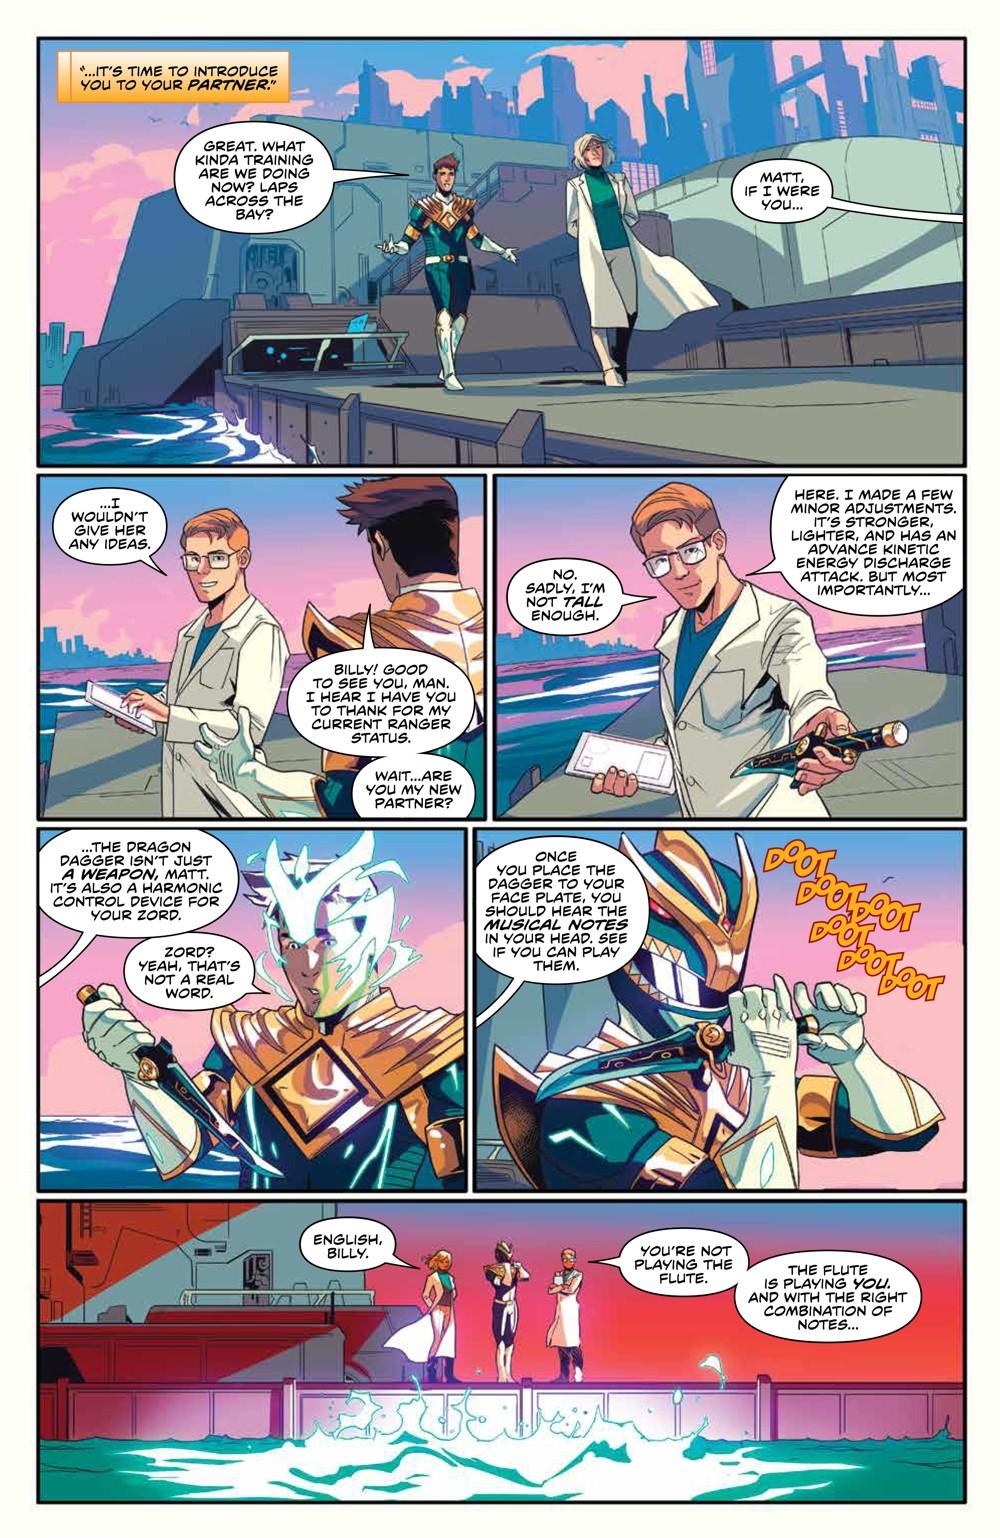 MightyMorphin_v2_SC_PRESS_19 ComicList Previews: MIGHTY MORPHIN VOLUME 2 TP